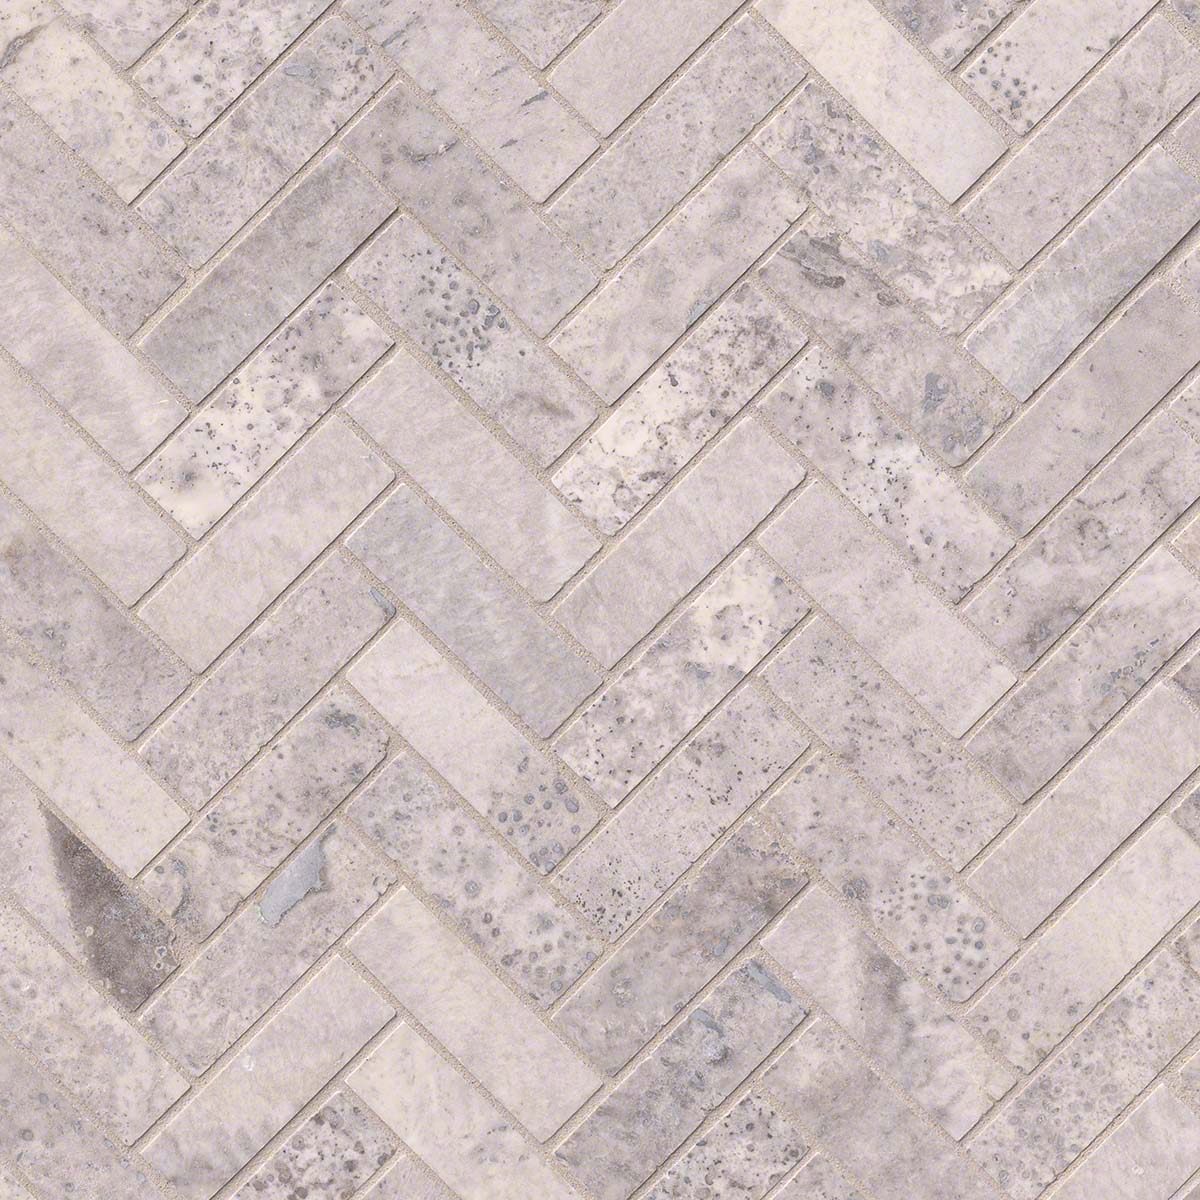 Buy Silver Travertine Herringbone Pattern Honed